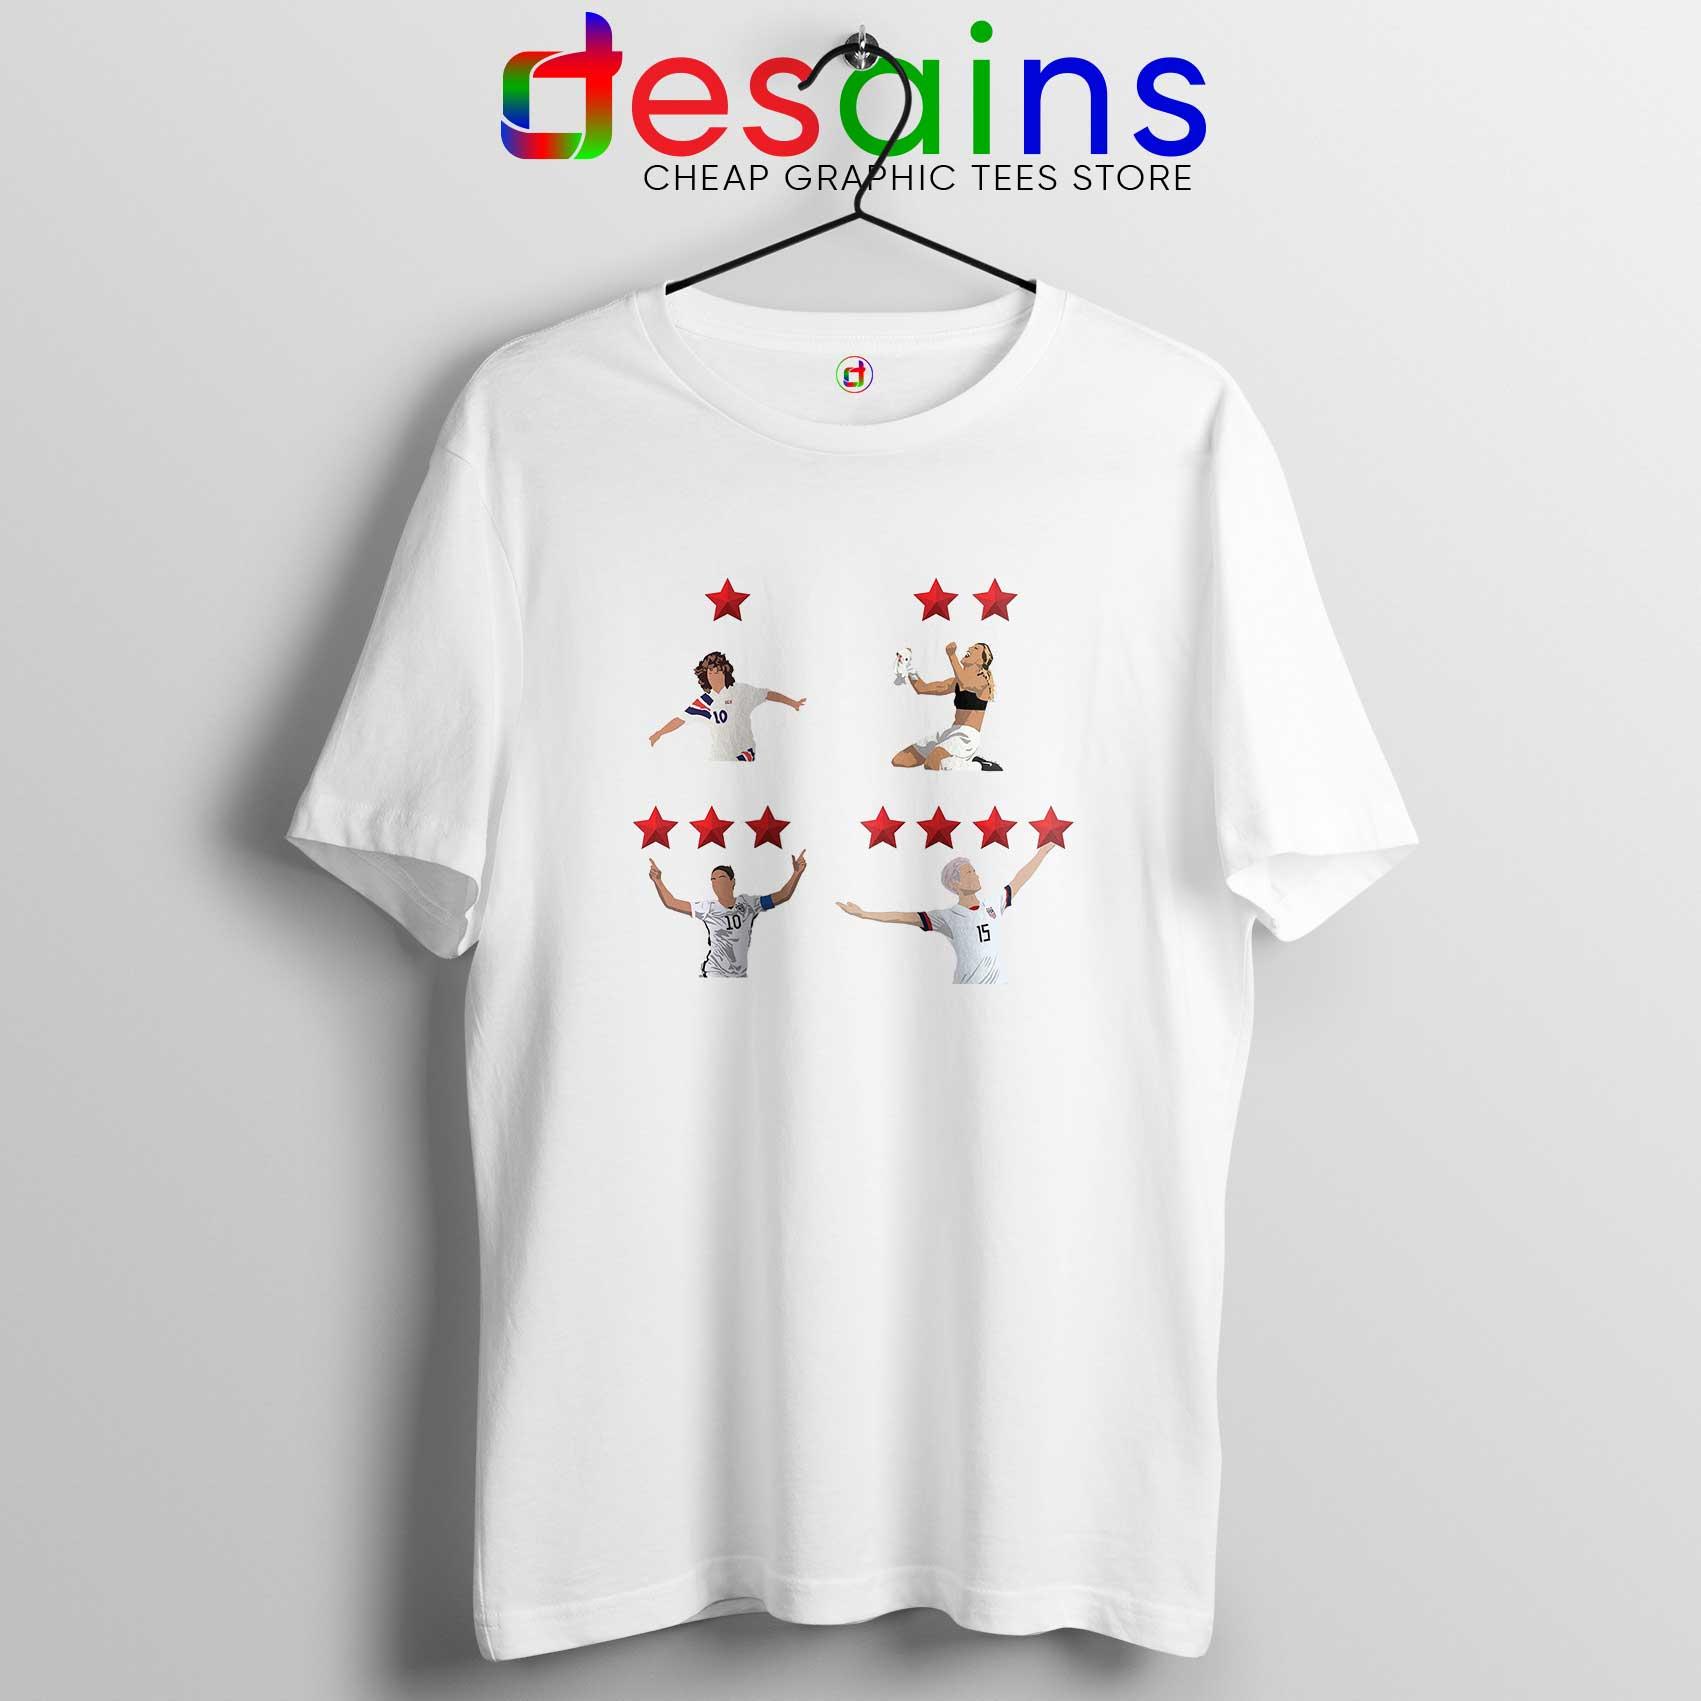 low priced 242f5 88c72 Megan Rapinoe and USWNT 4 Stars Tee Shirt USWNT Tshirt Size S-3XL